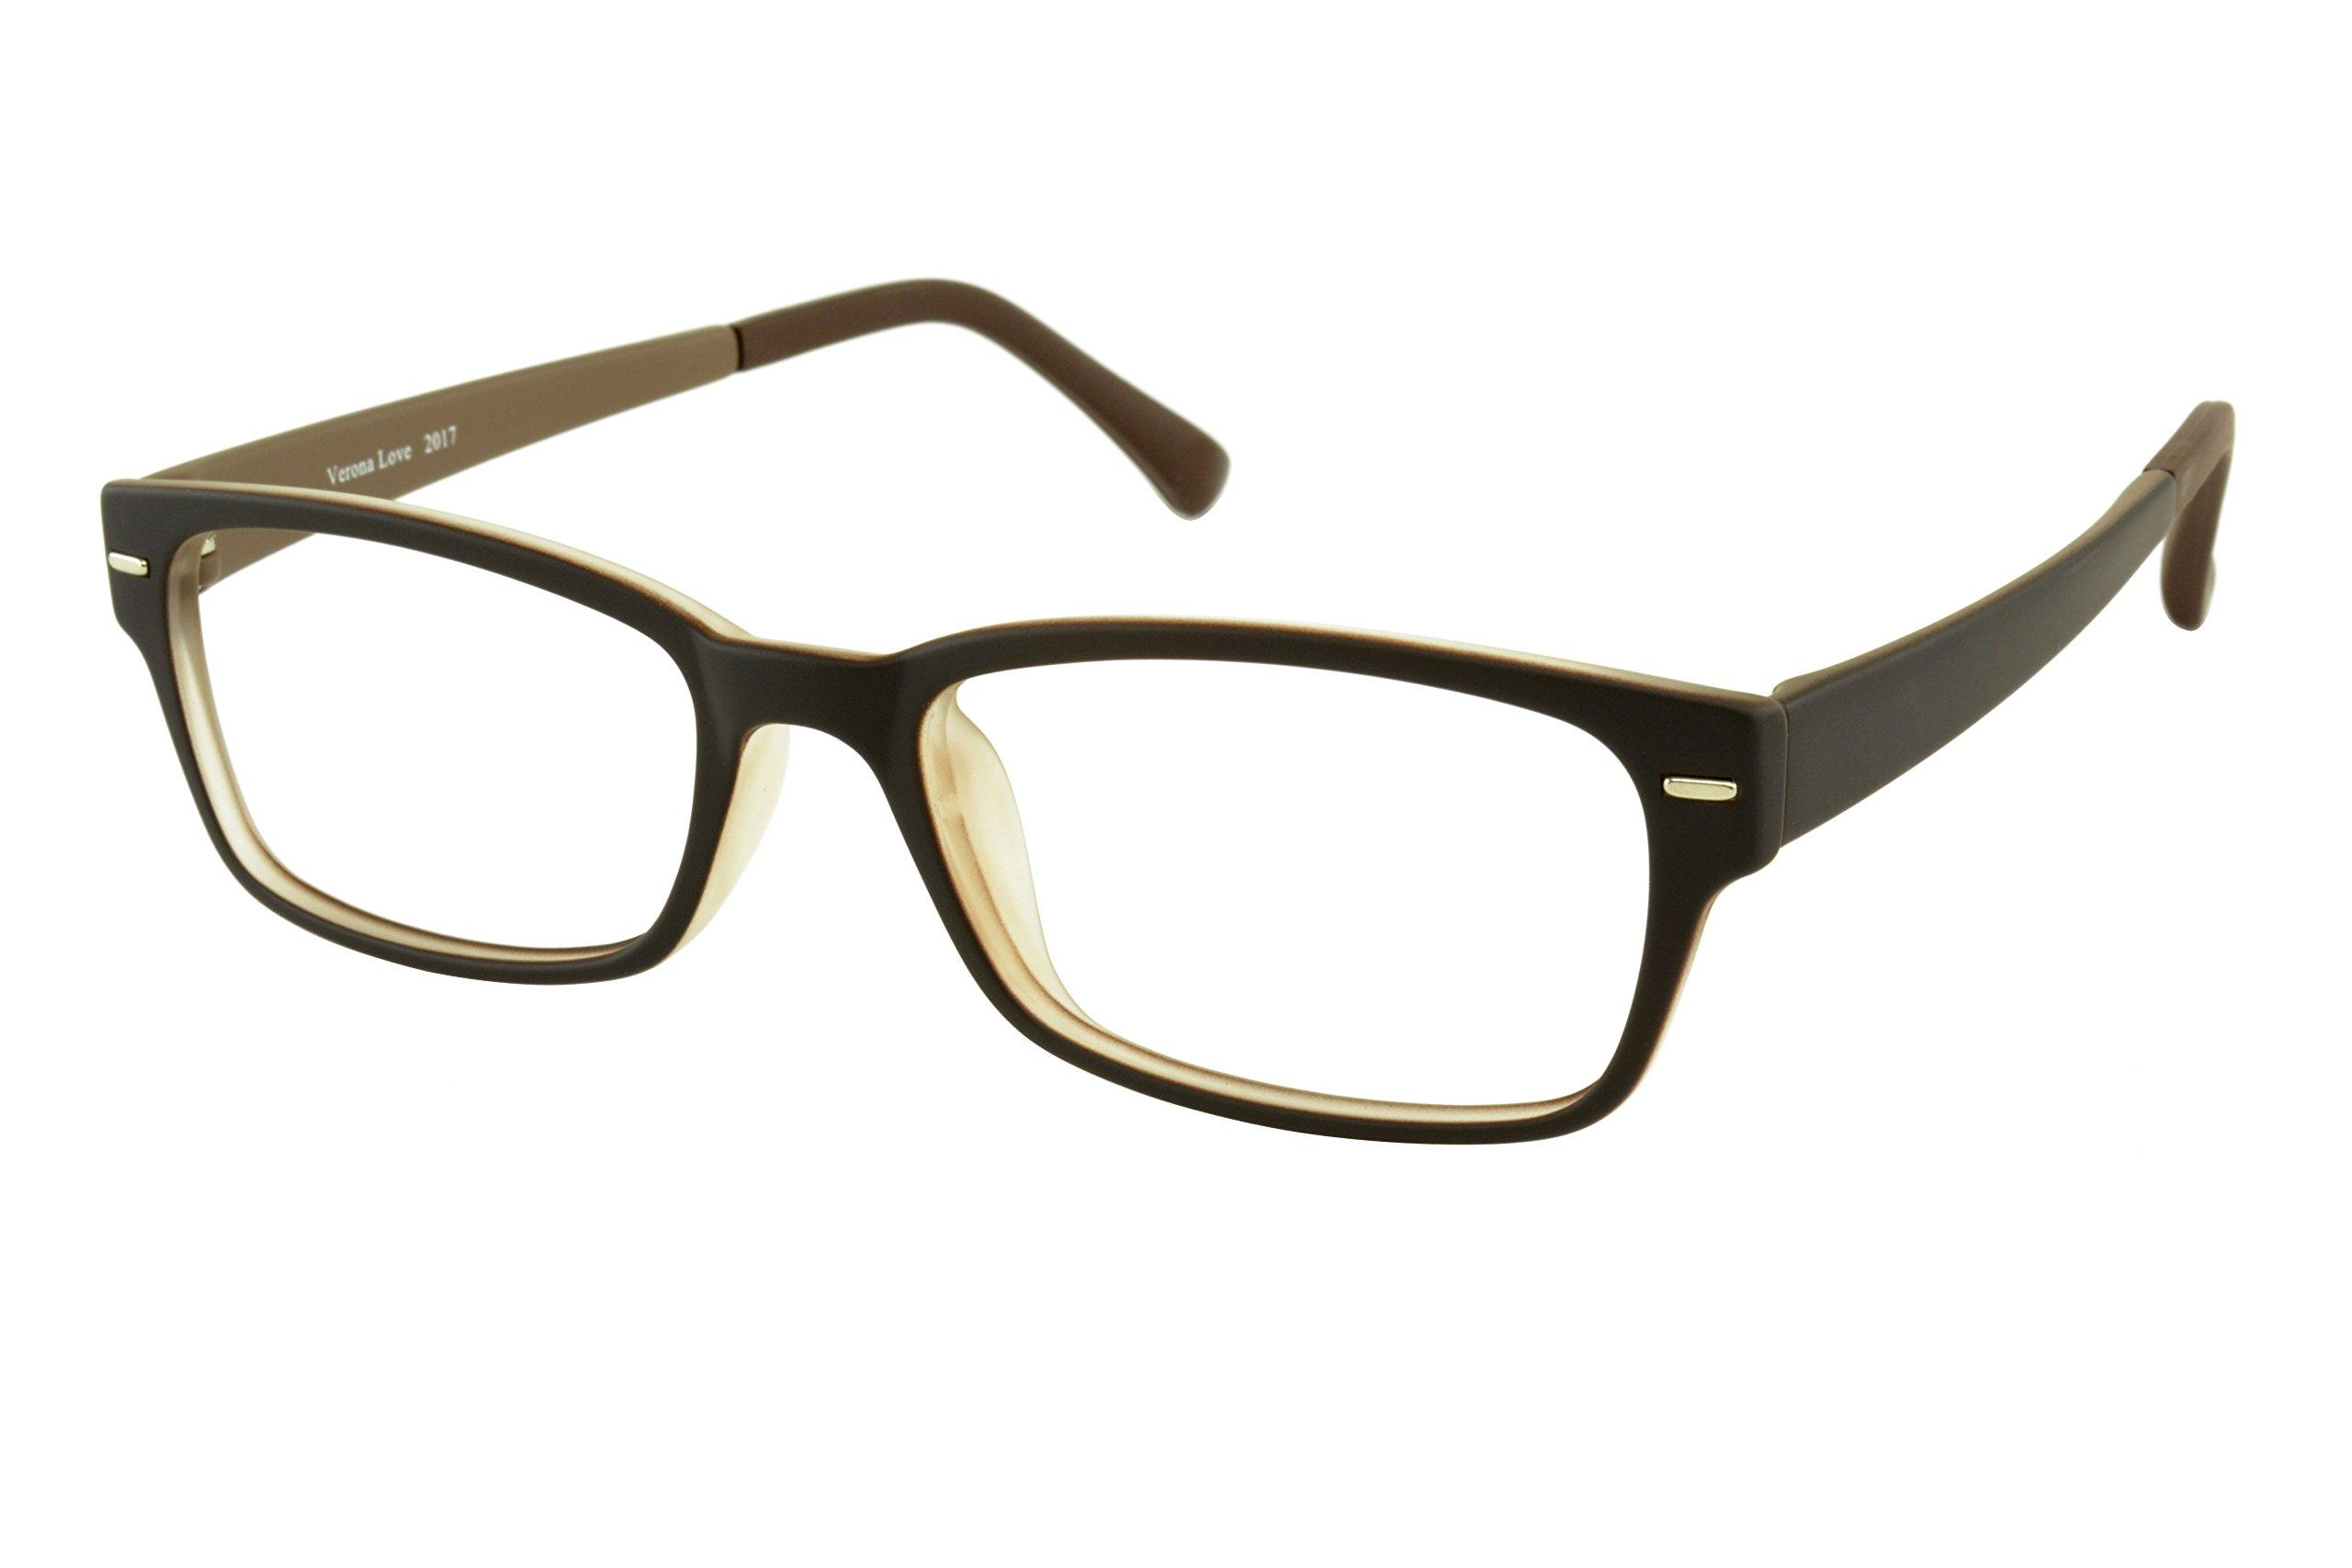 Verona Love Computer Glasses Vintage Style w/Blue Light Blocking Lenses For Gaming Reading Blue Screen Filter and Blocker Glasses (Brown&Black)